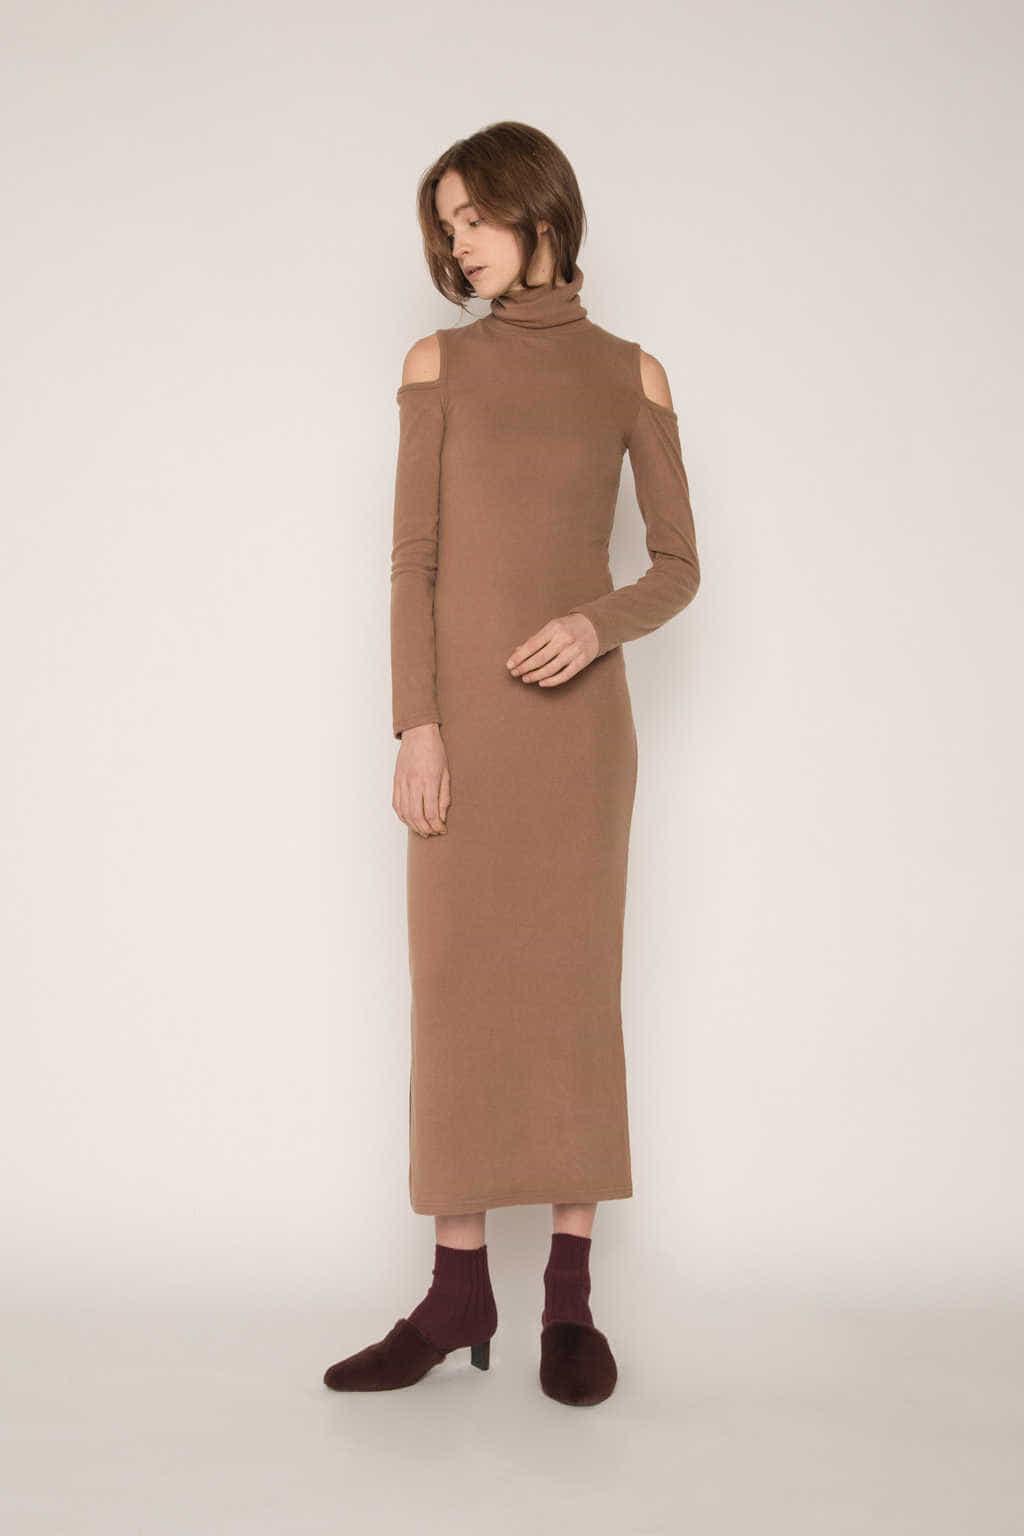 Dress H339 Beige 2